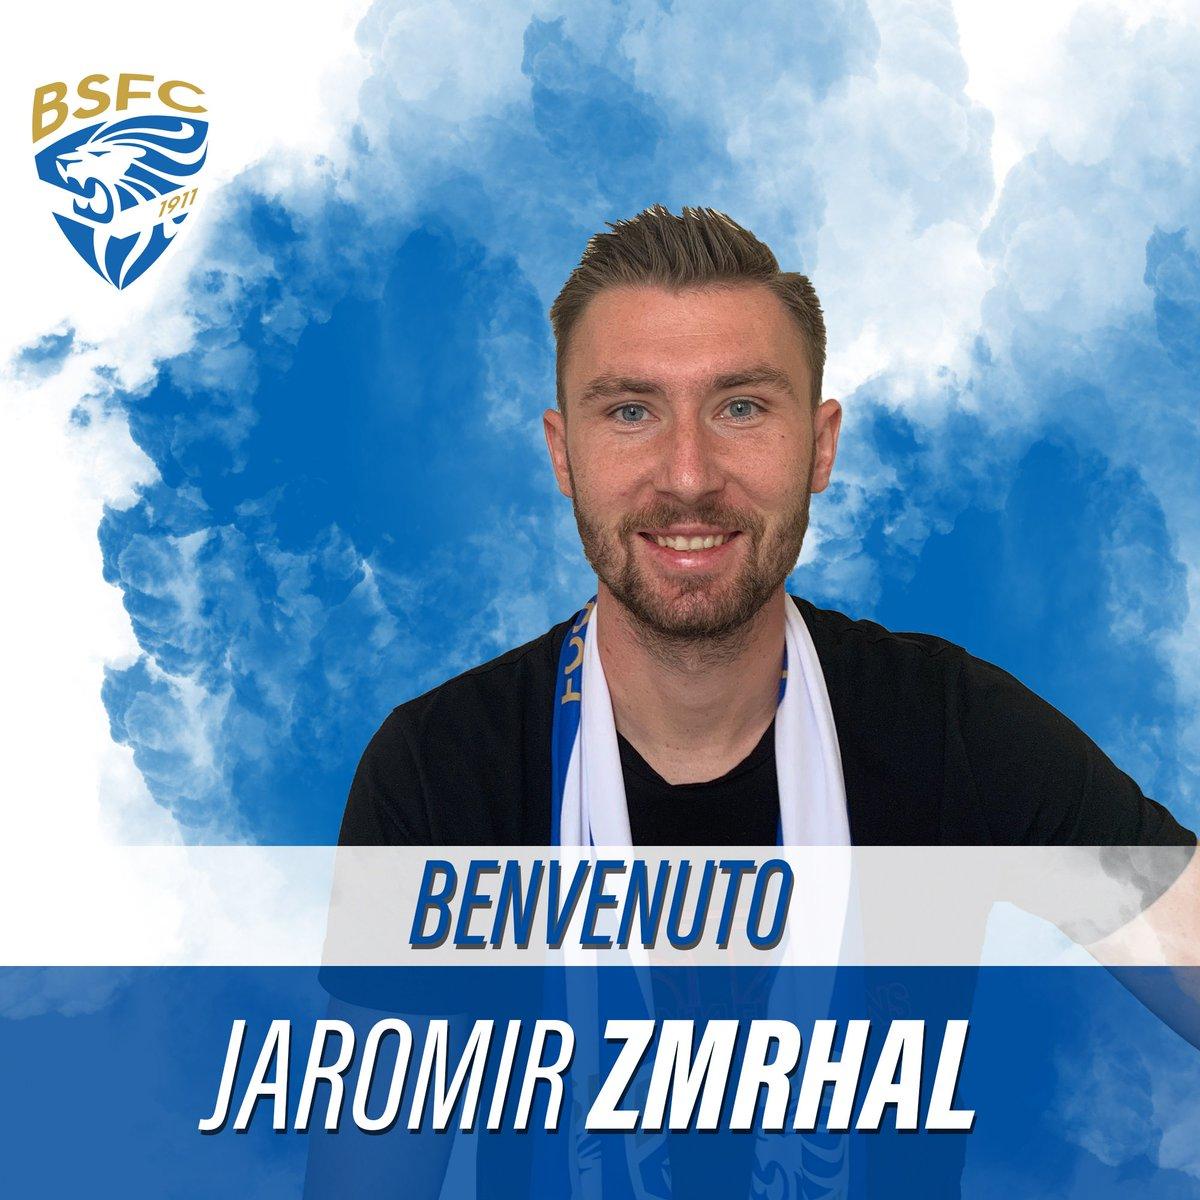 Jaromir Zmrhal